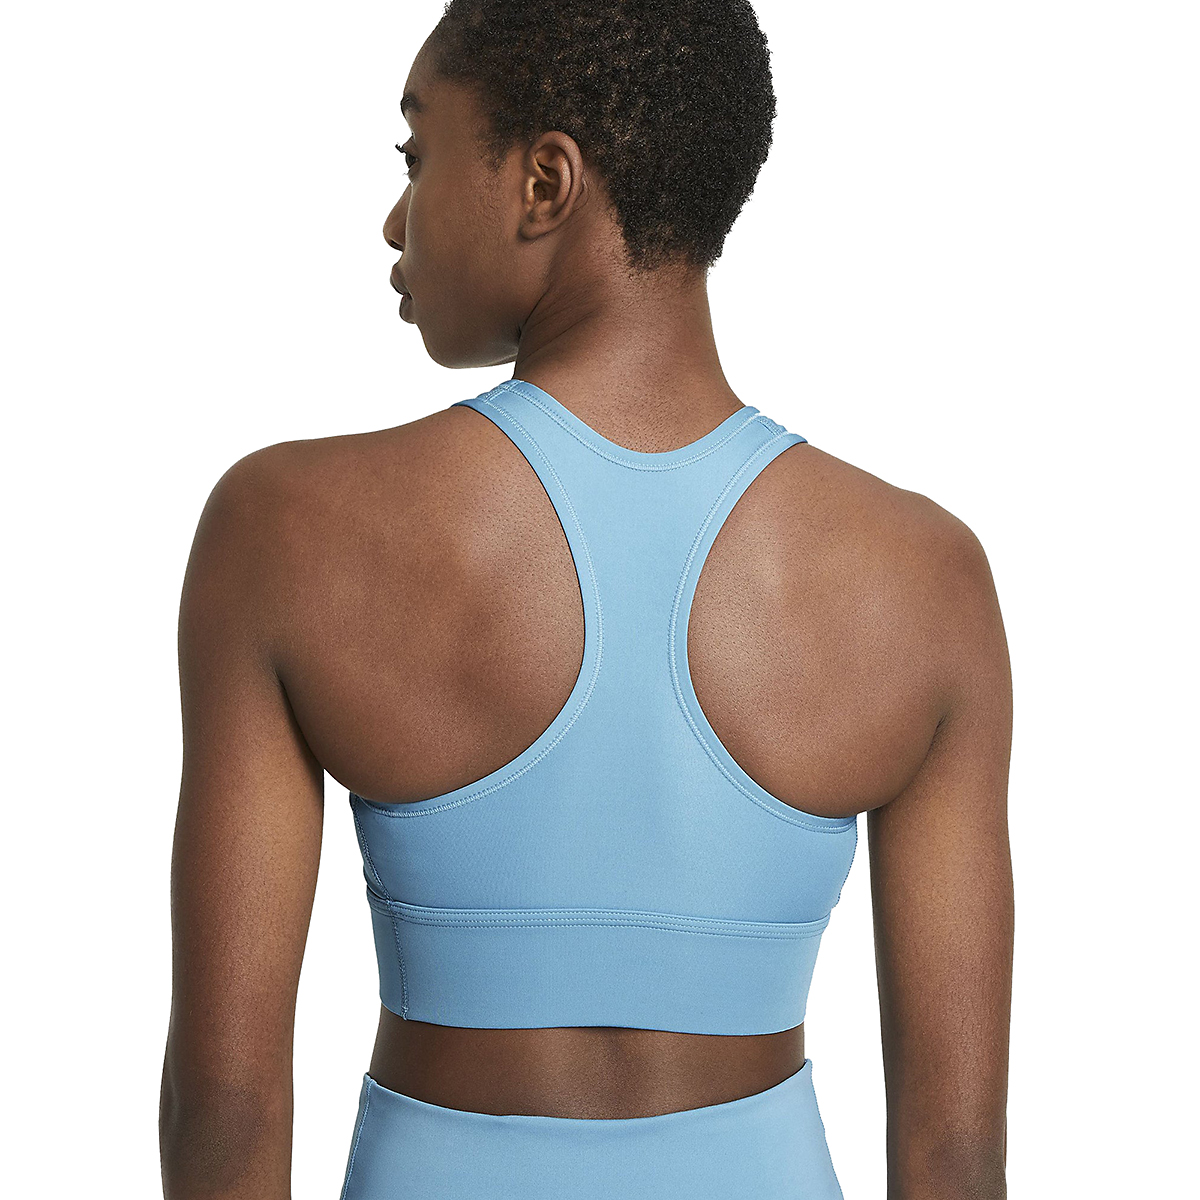 Women's Nike Swoosh Long Line Bra - Color: Cerulean/White - Size: XS, Cerulean/White, large, image 4